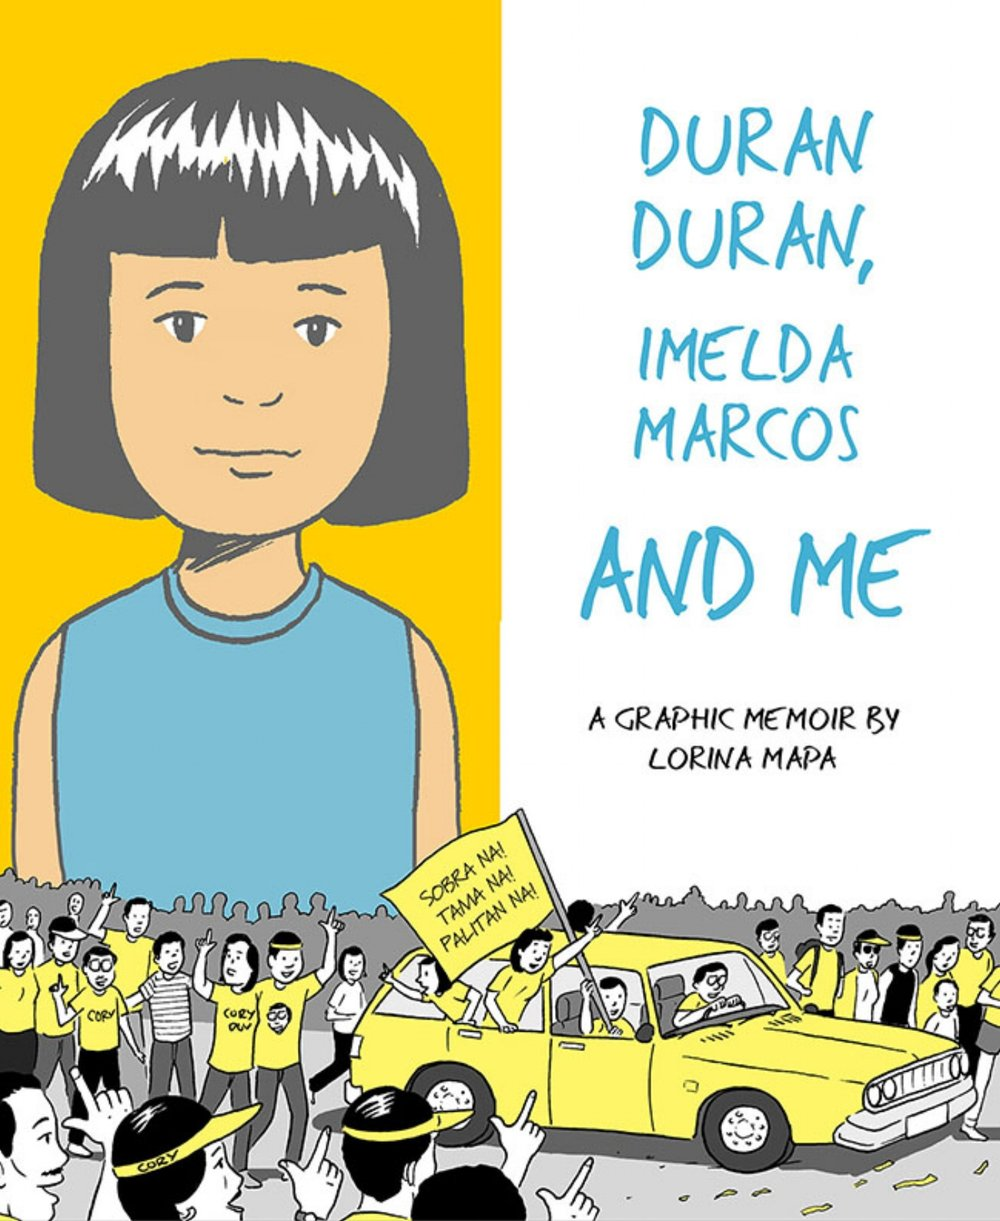 Lorina Mapa. Duran Duran, Imelda Marcos, and Me. Conundrum Press. $18.00, 140 pp. ISBN:9781772620115